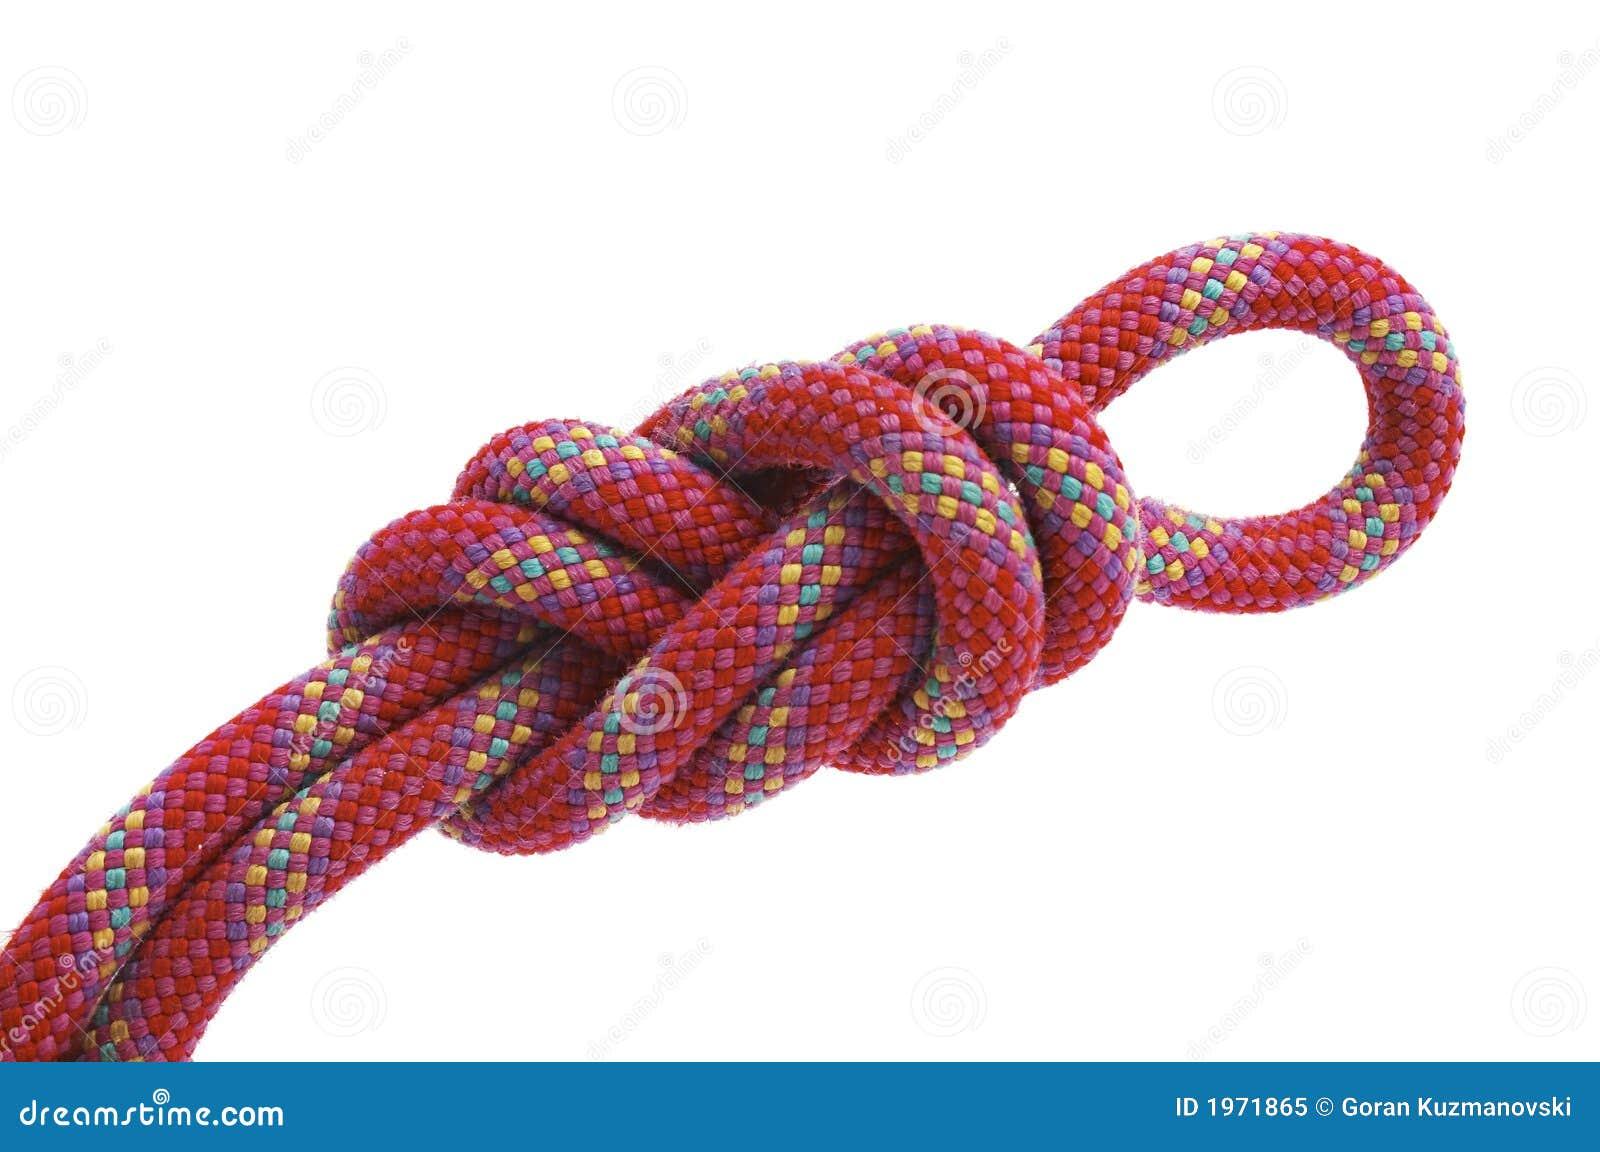 Climbing knot, figure eight